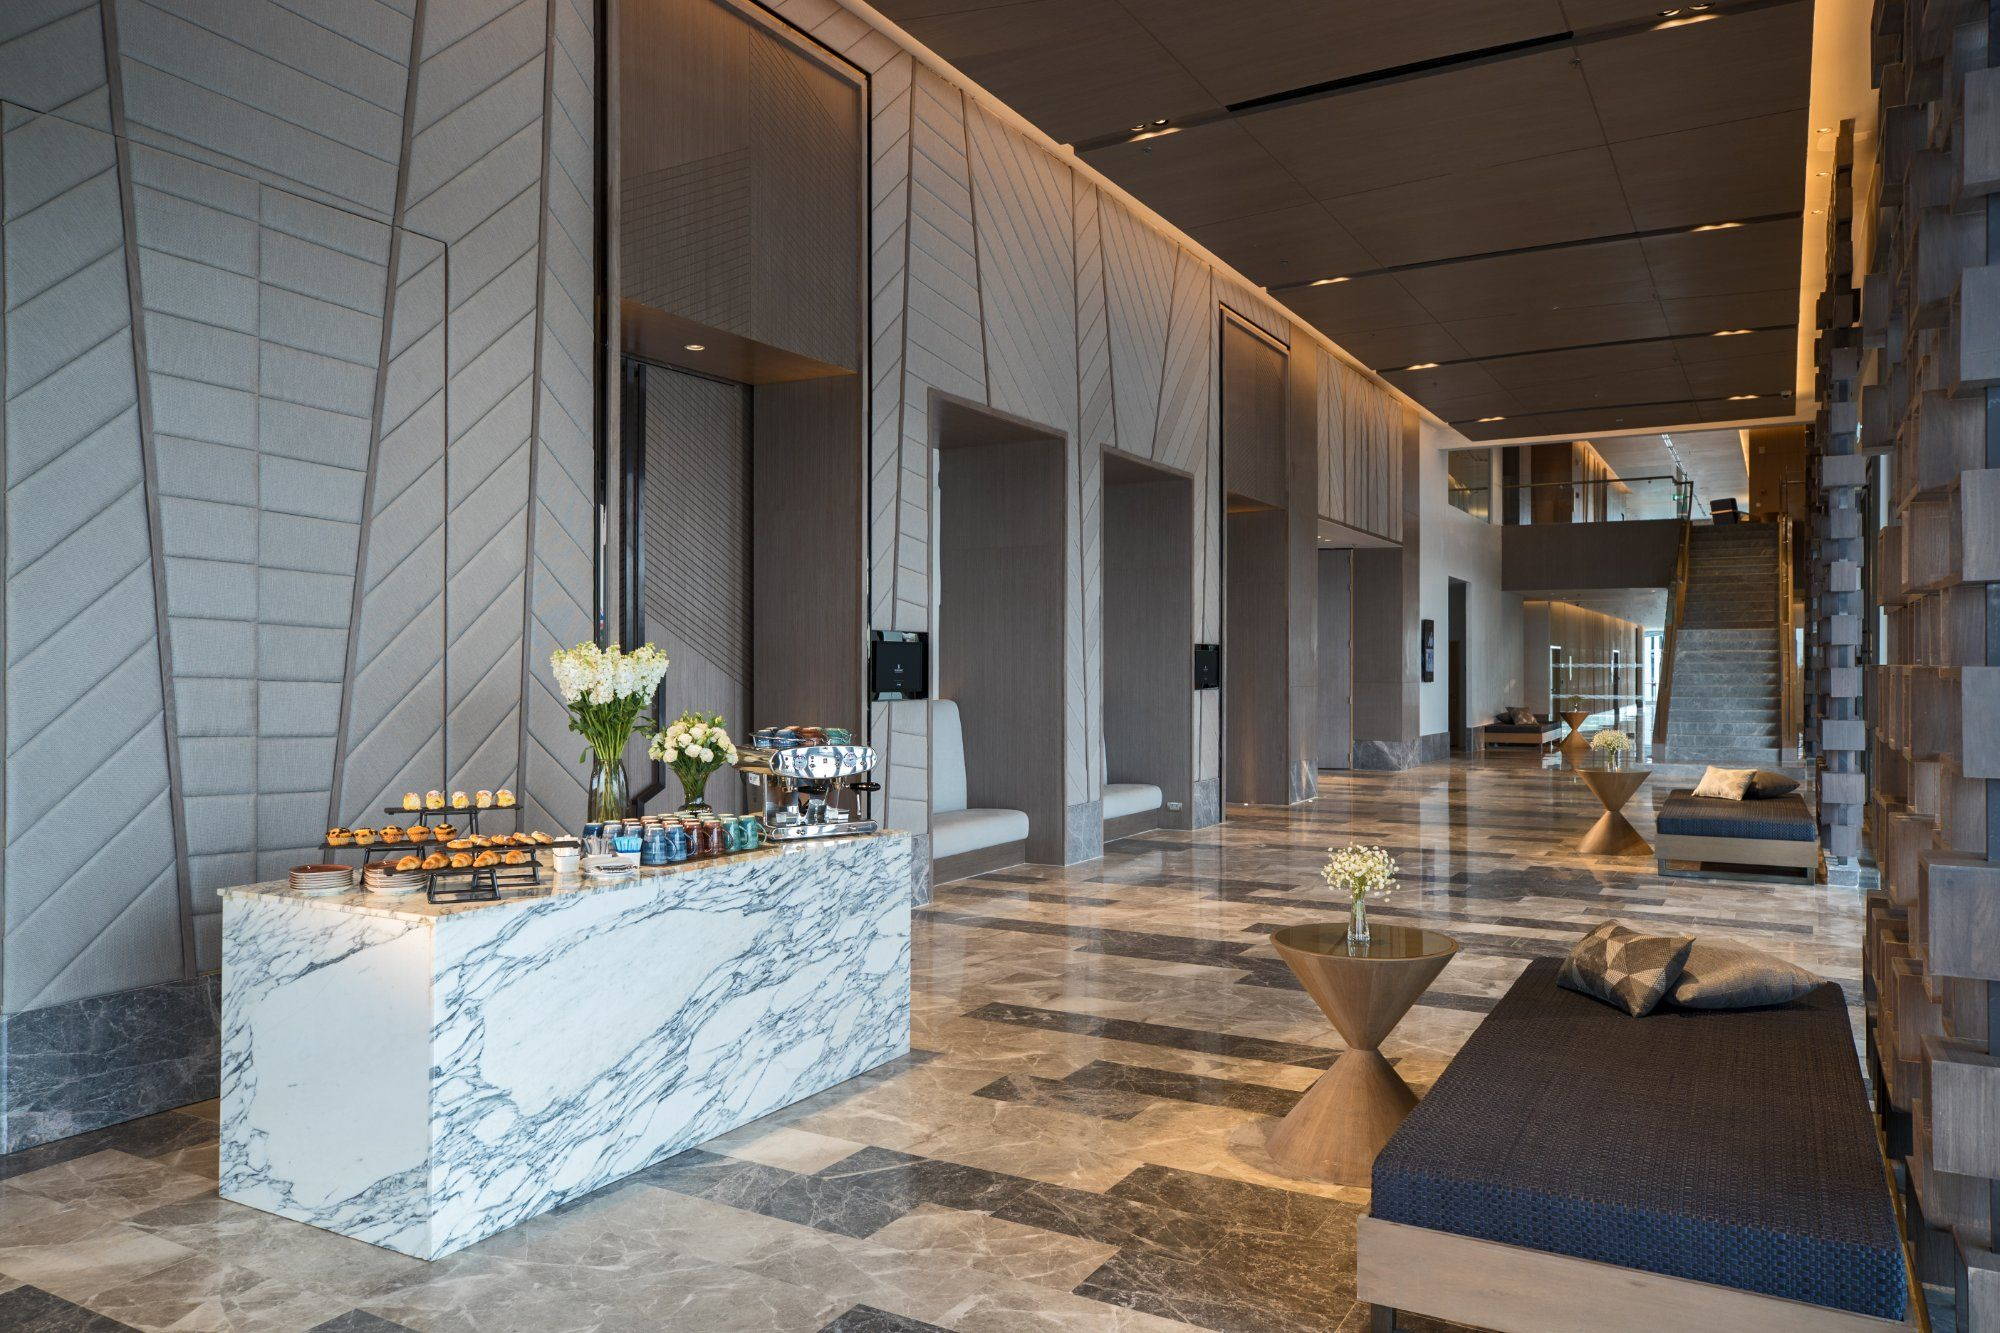 Renaissance Pattaya Resort & Spa: UPDATED 2018 Reviews ...